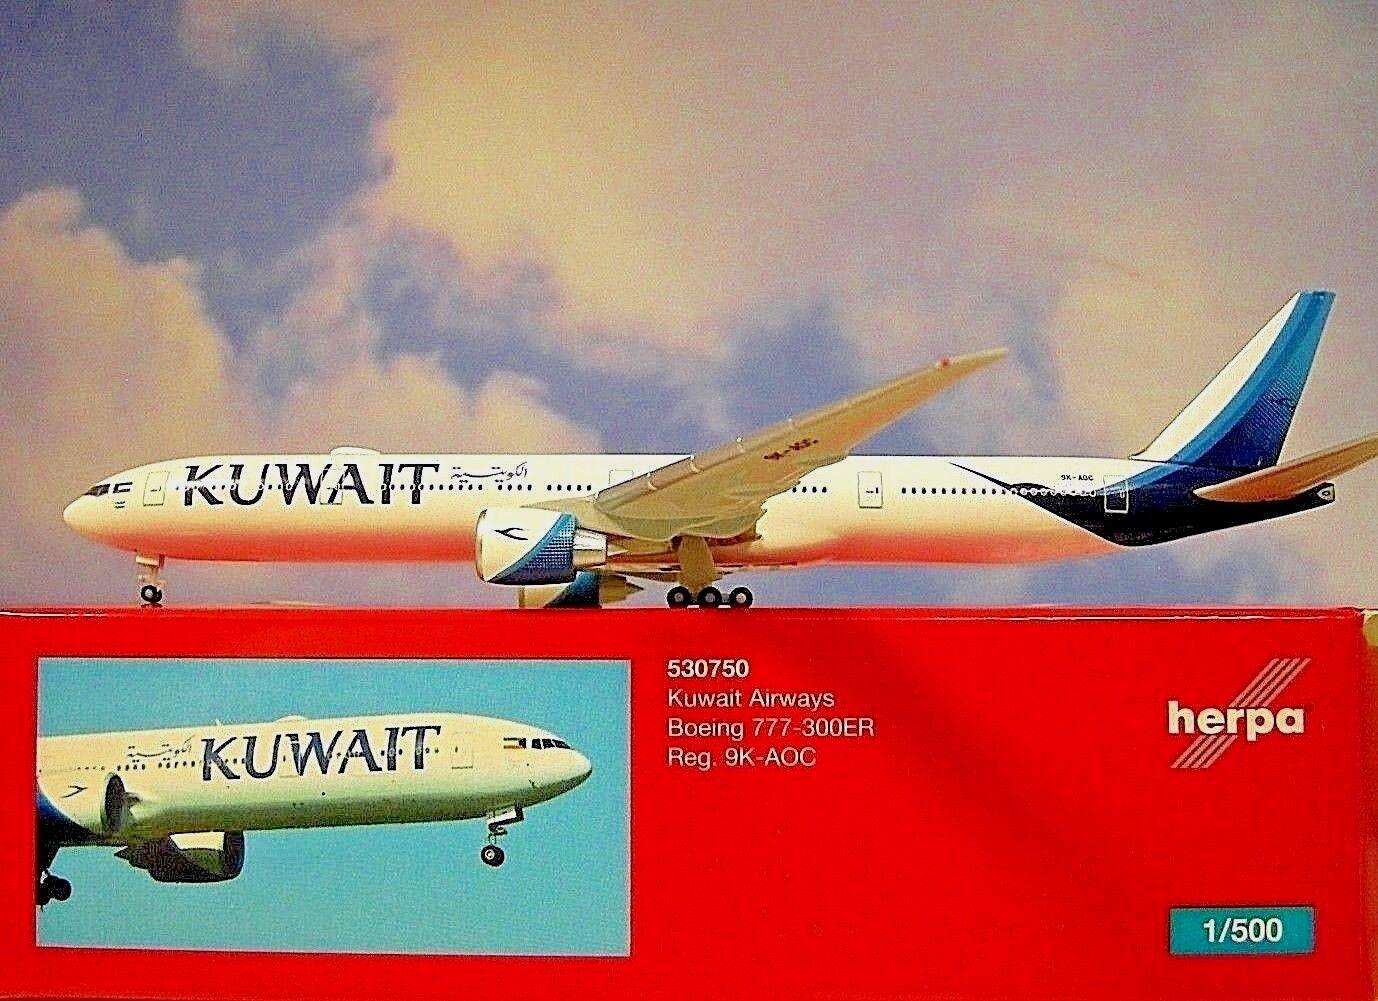 Herpa Wings 1 1 1 500 Boeing 777-300ER Kuwait Airways 9K-AOC 530750 Modellairport500 b441e4